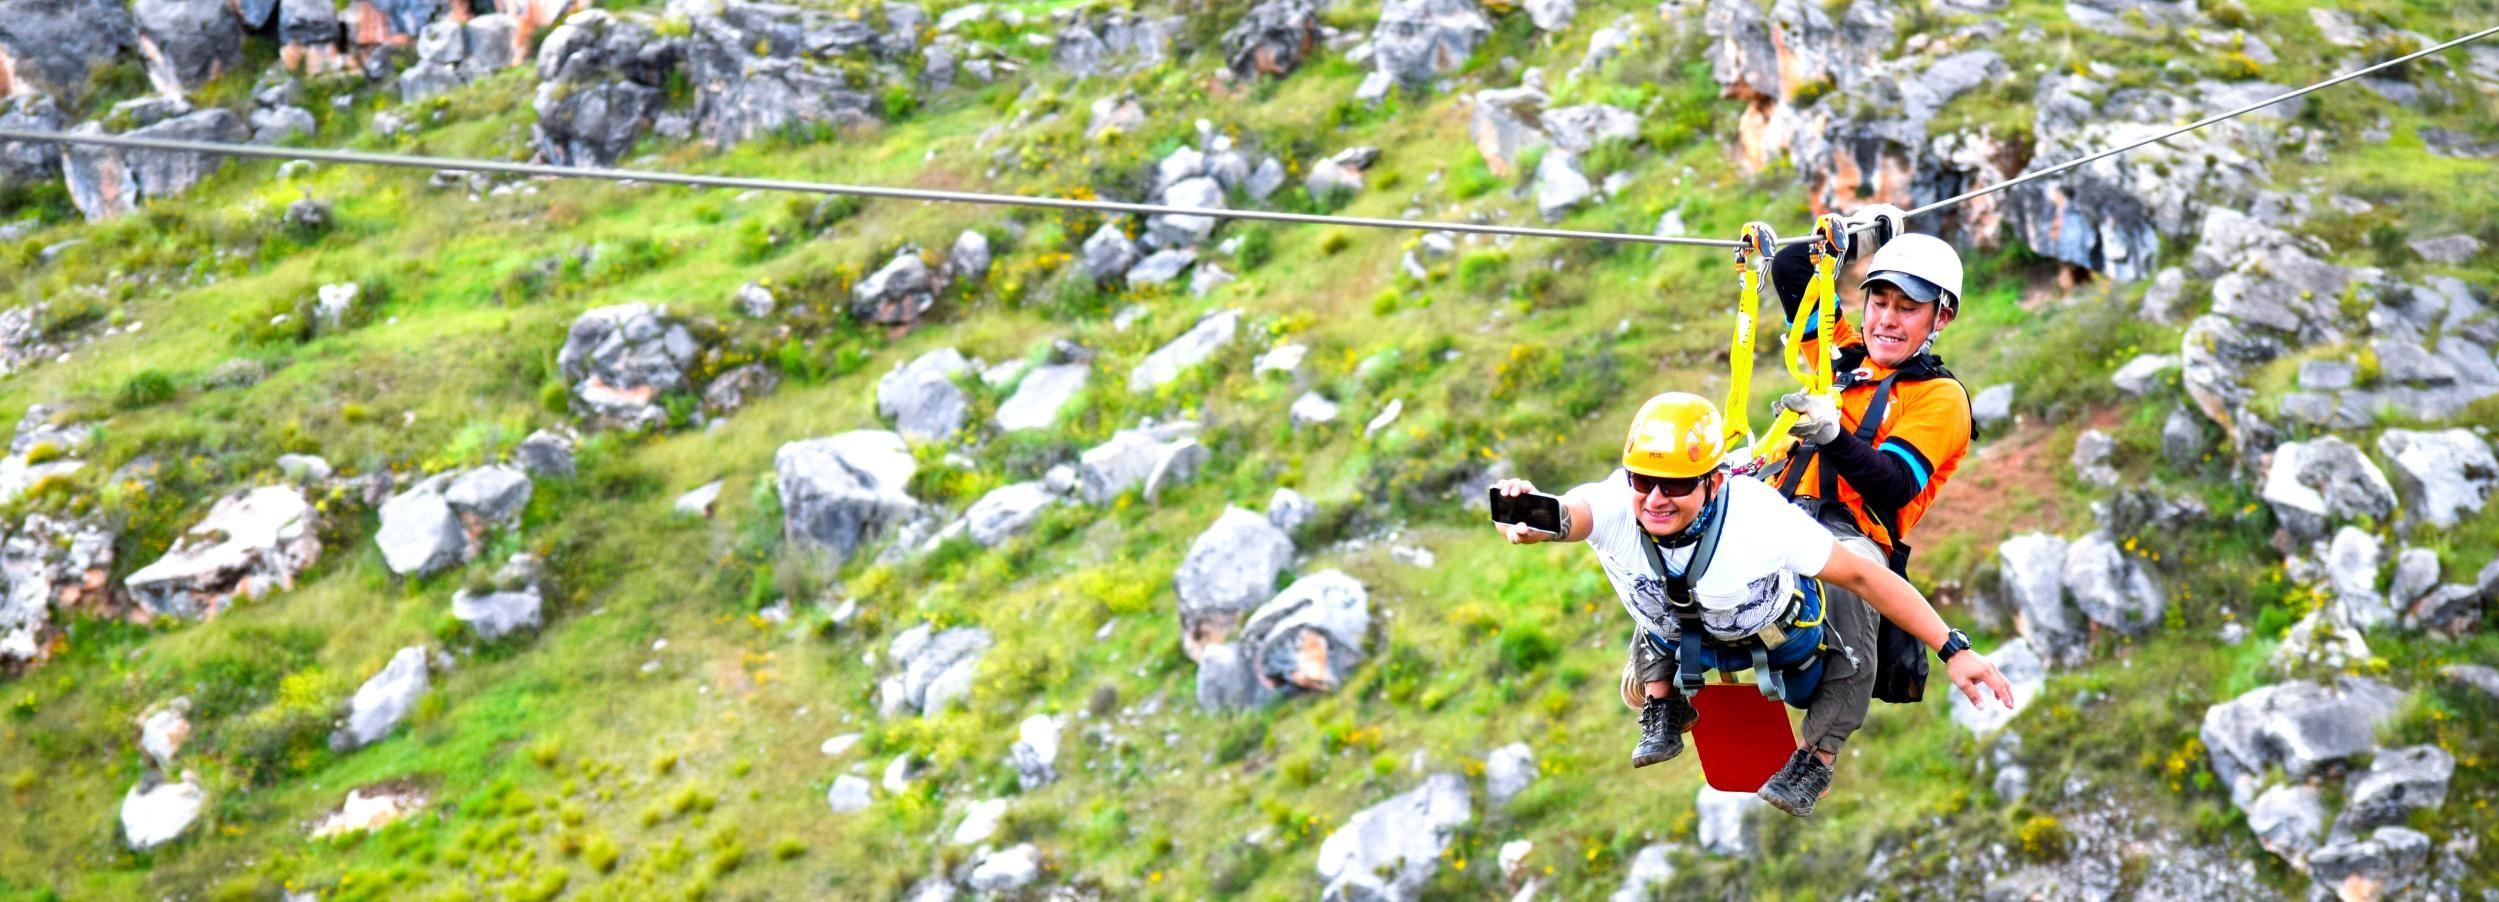 Cuzco: tour de Chinchero y tirolina de medio día